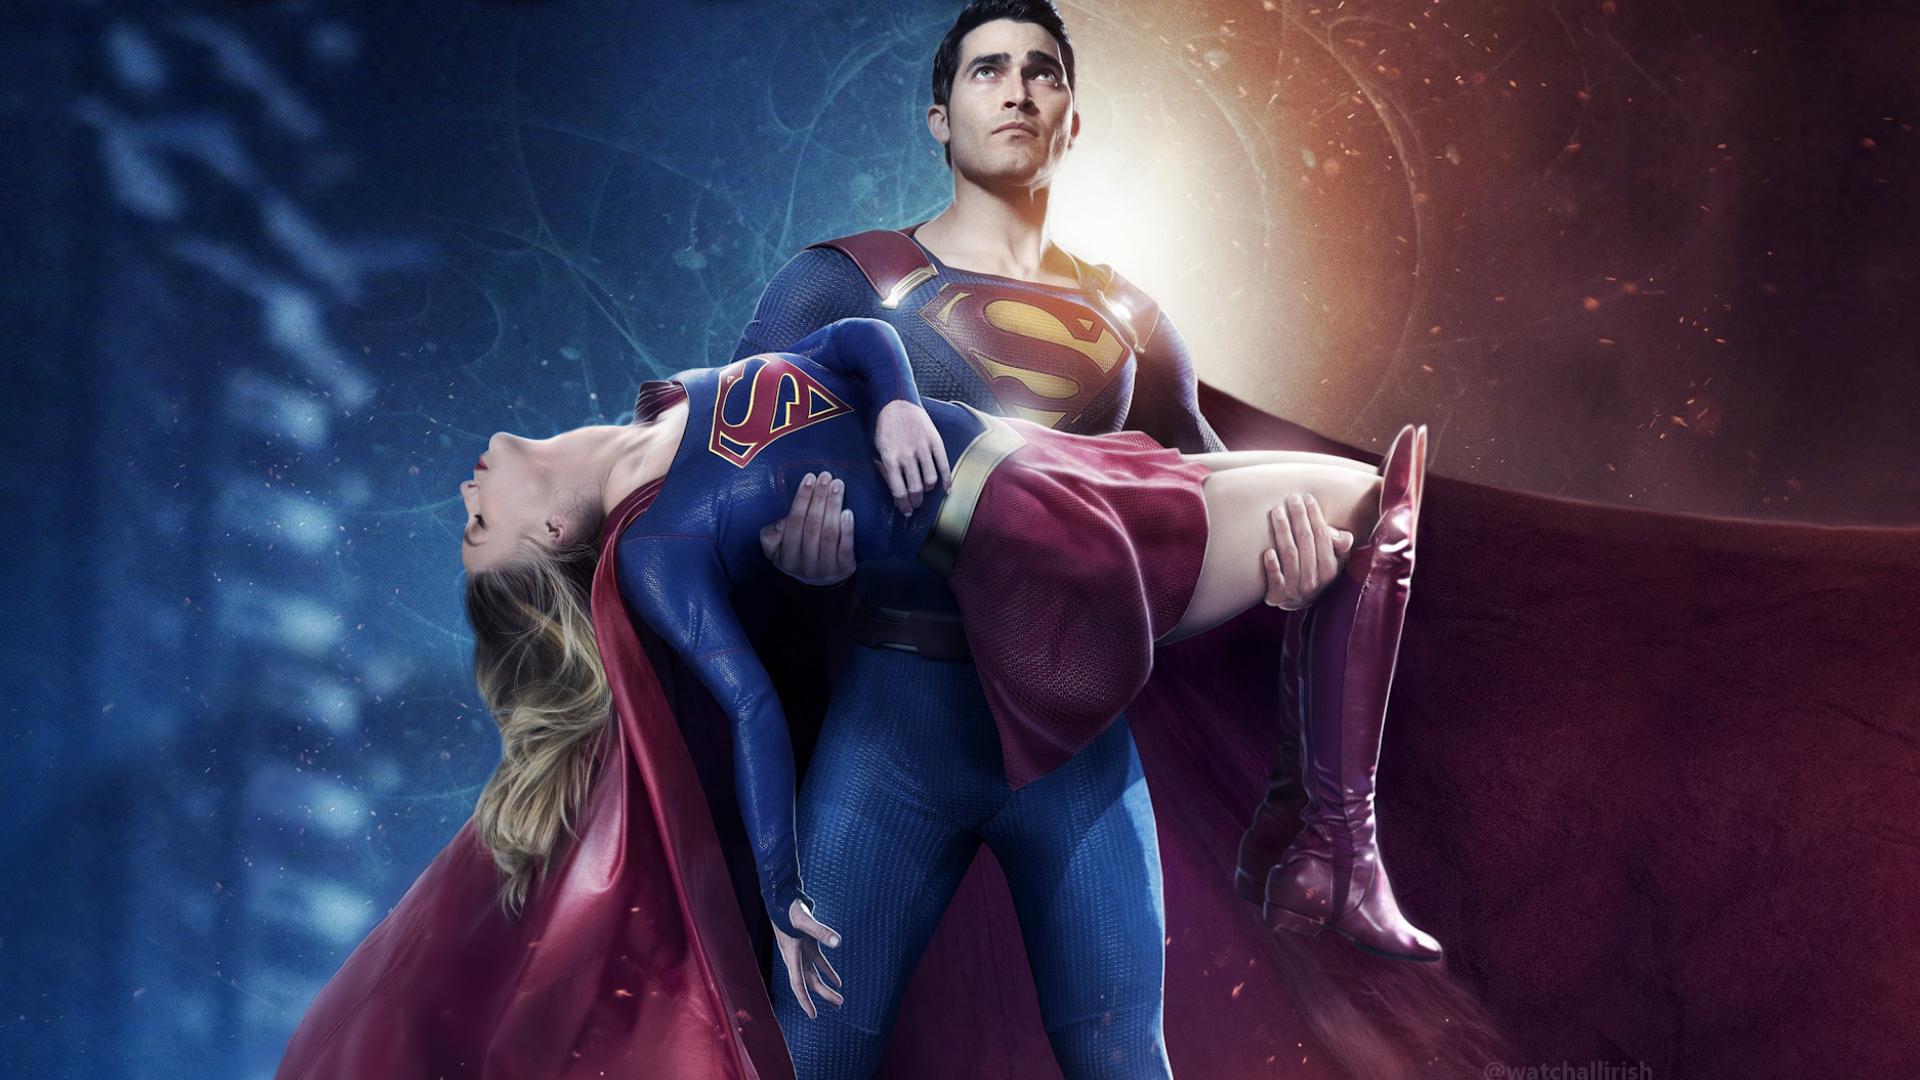 Resultado de imagem para supergirl season 2 wallpaper